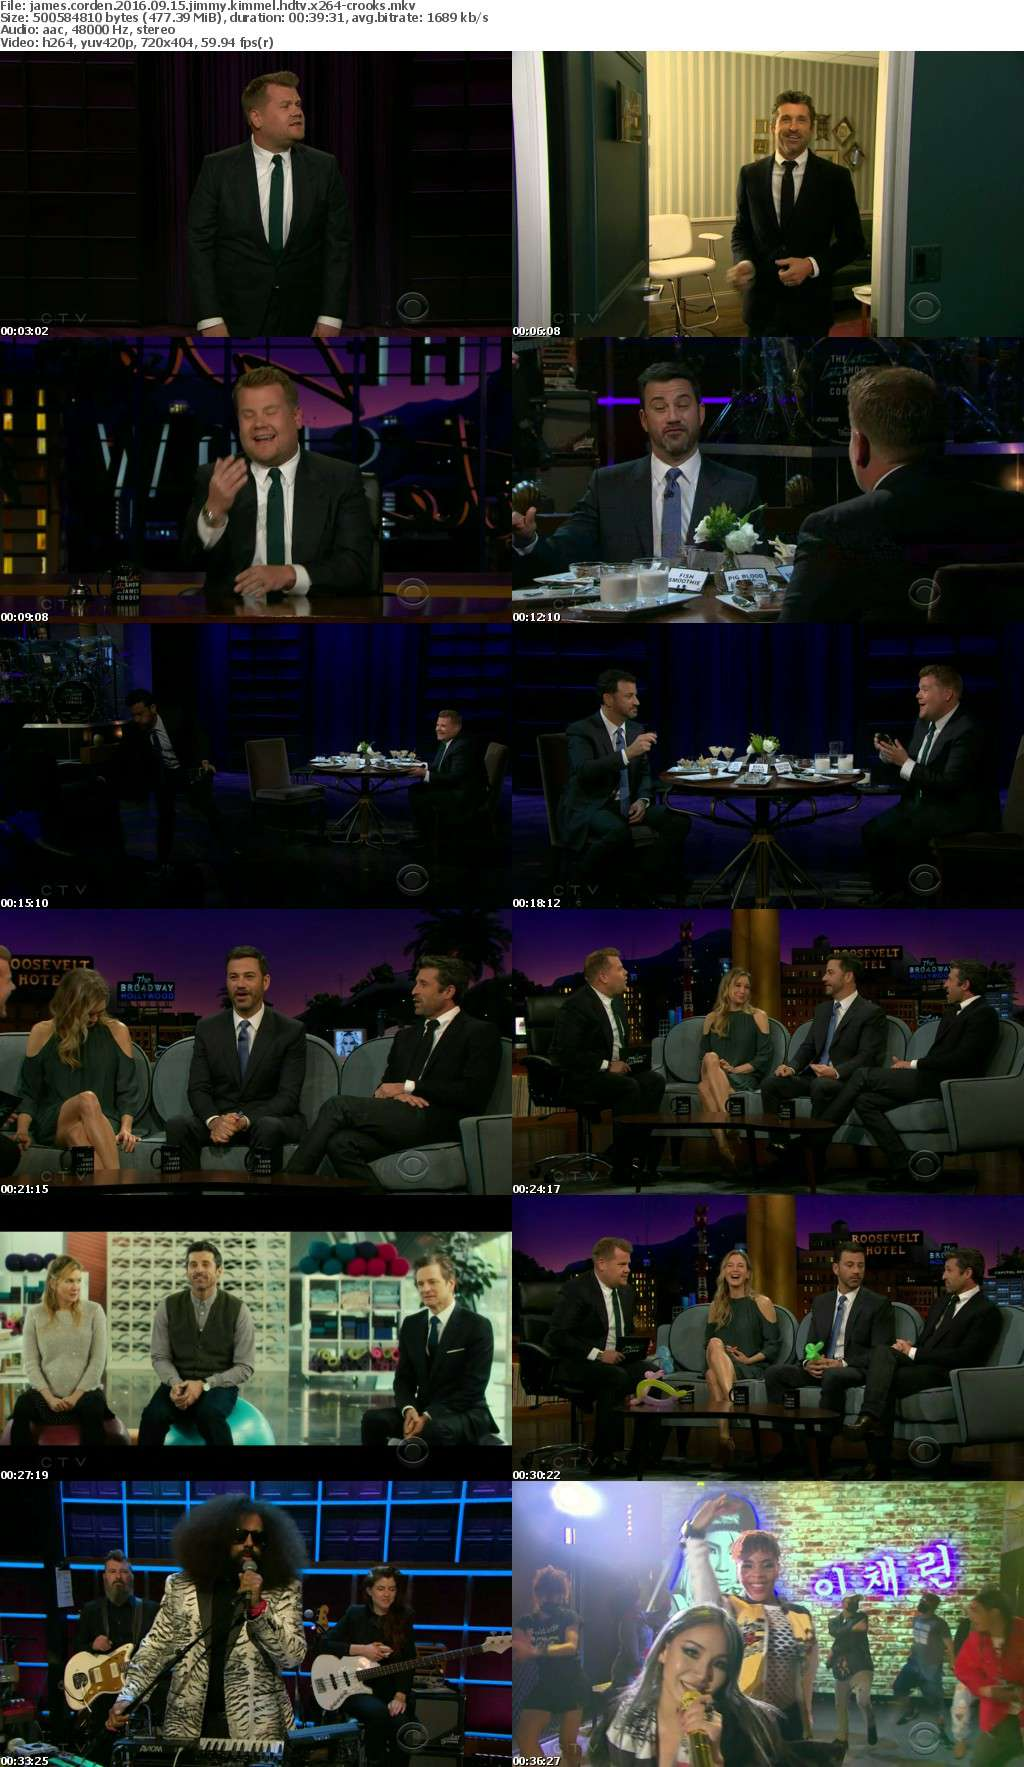 James Corden 2016 09 15 Jimmy Kimmel HDTV x264-CROOKS